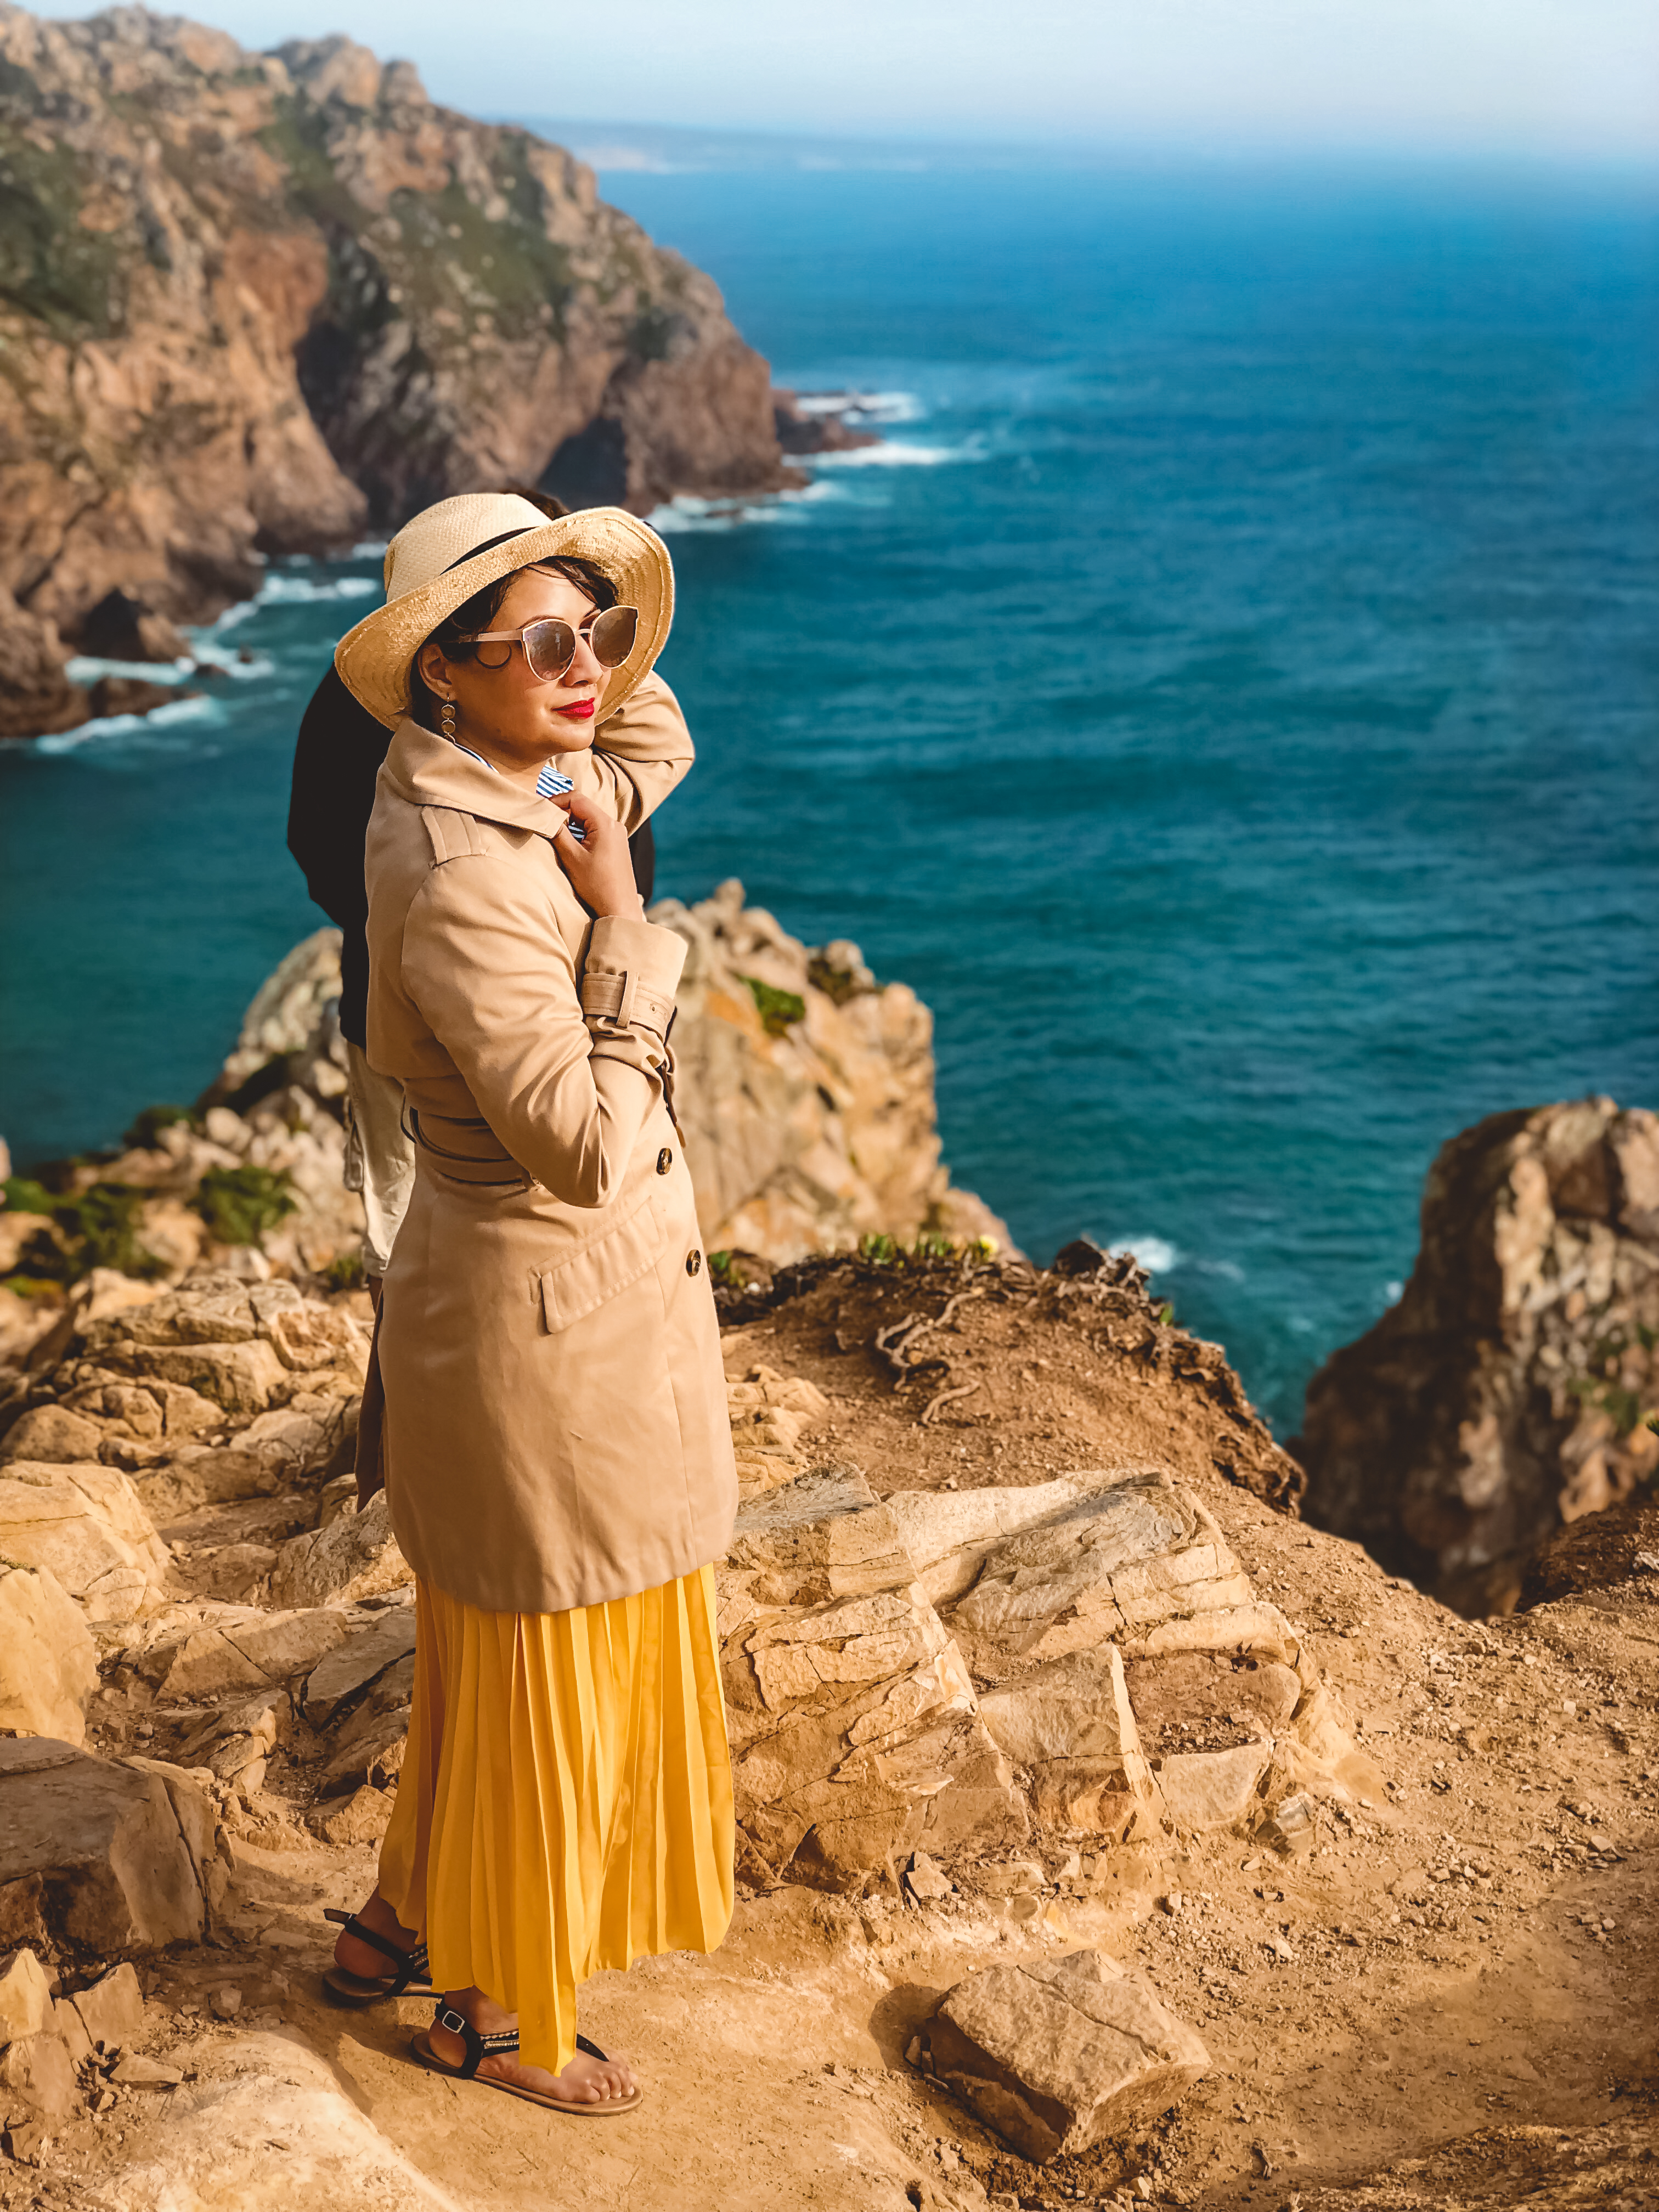 Muslim-travel-guide-Sintra-Portugal-travel-tips-Cabo-da-Roca